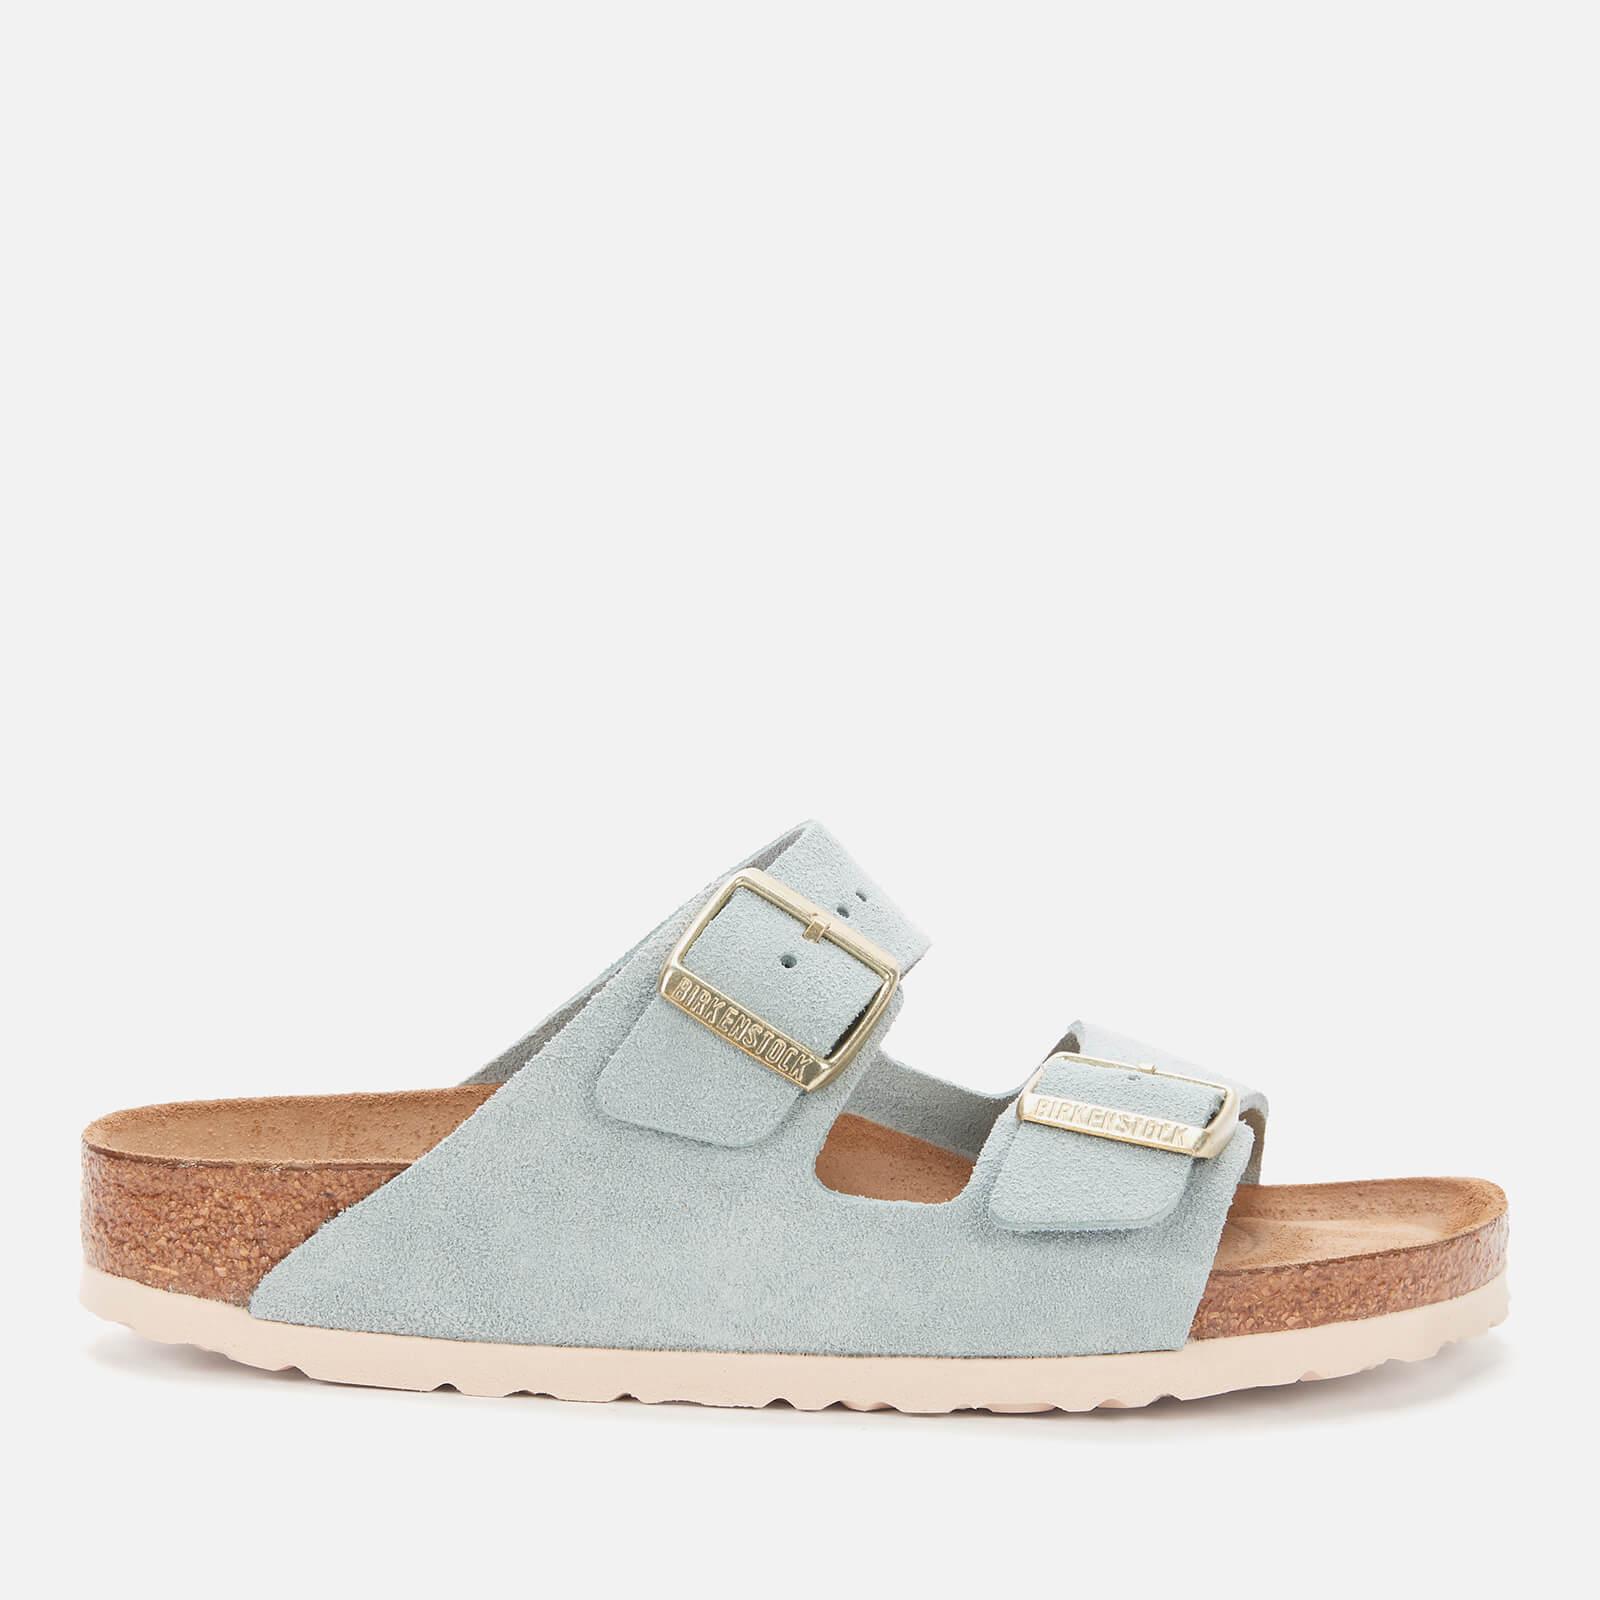 Birkenstock Womens Arizona Sfb Suede Double Strap Sandals Light Blue Eu 38 Uk 5